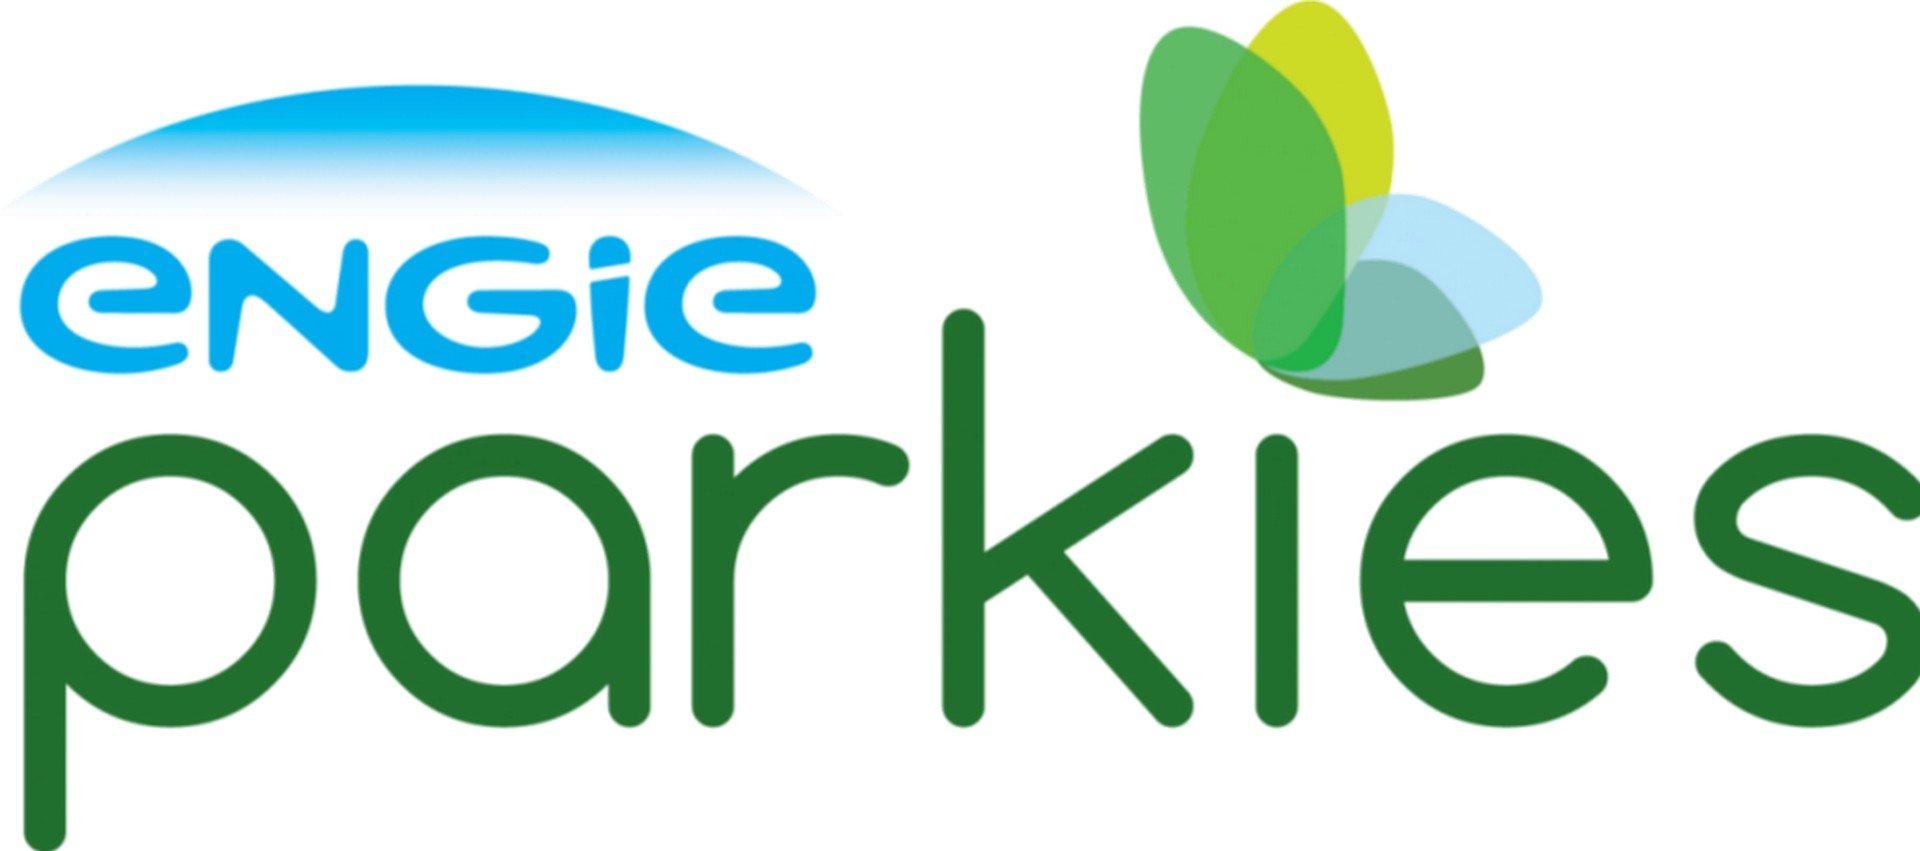 De Parkies houden met Kate Ryan, Cocojr., Tom Helsen en Belle Perez een 'Liefde voor Muziek'-rëunie - Logo engie Parkies